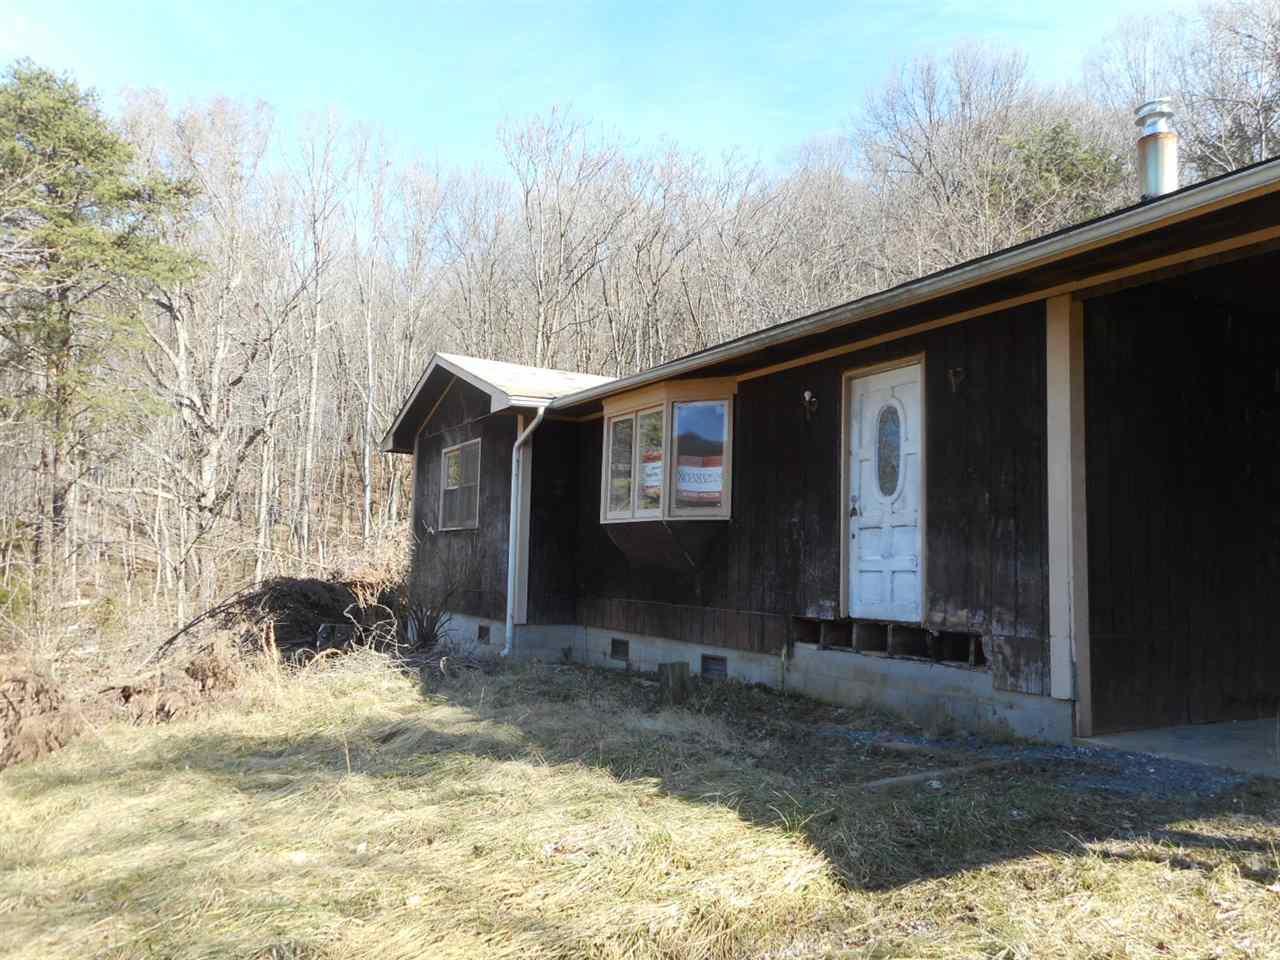 207 VIEW MOUNTAIN RD, STANLEY, VA 22851